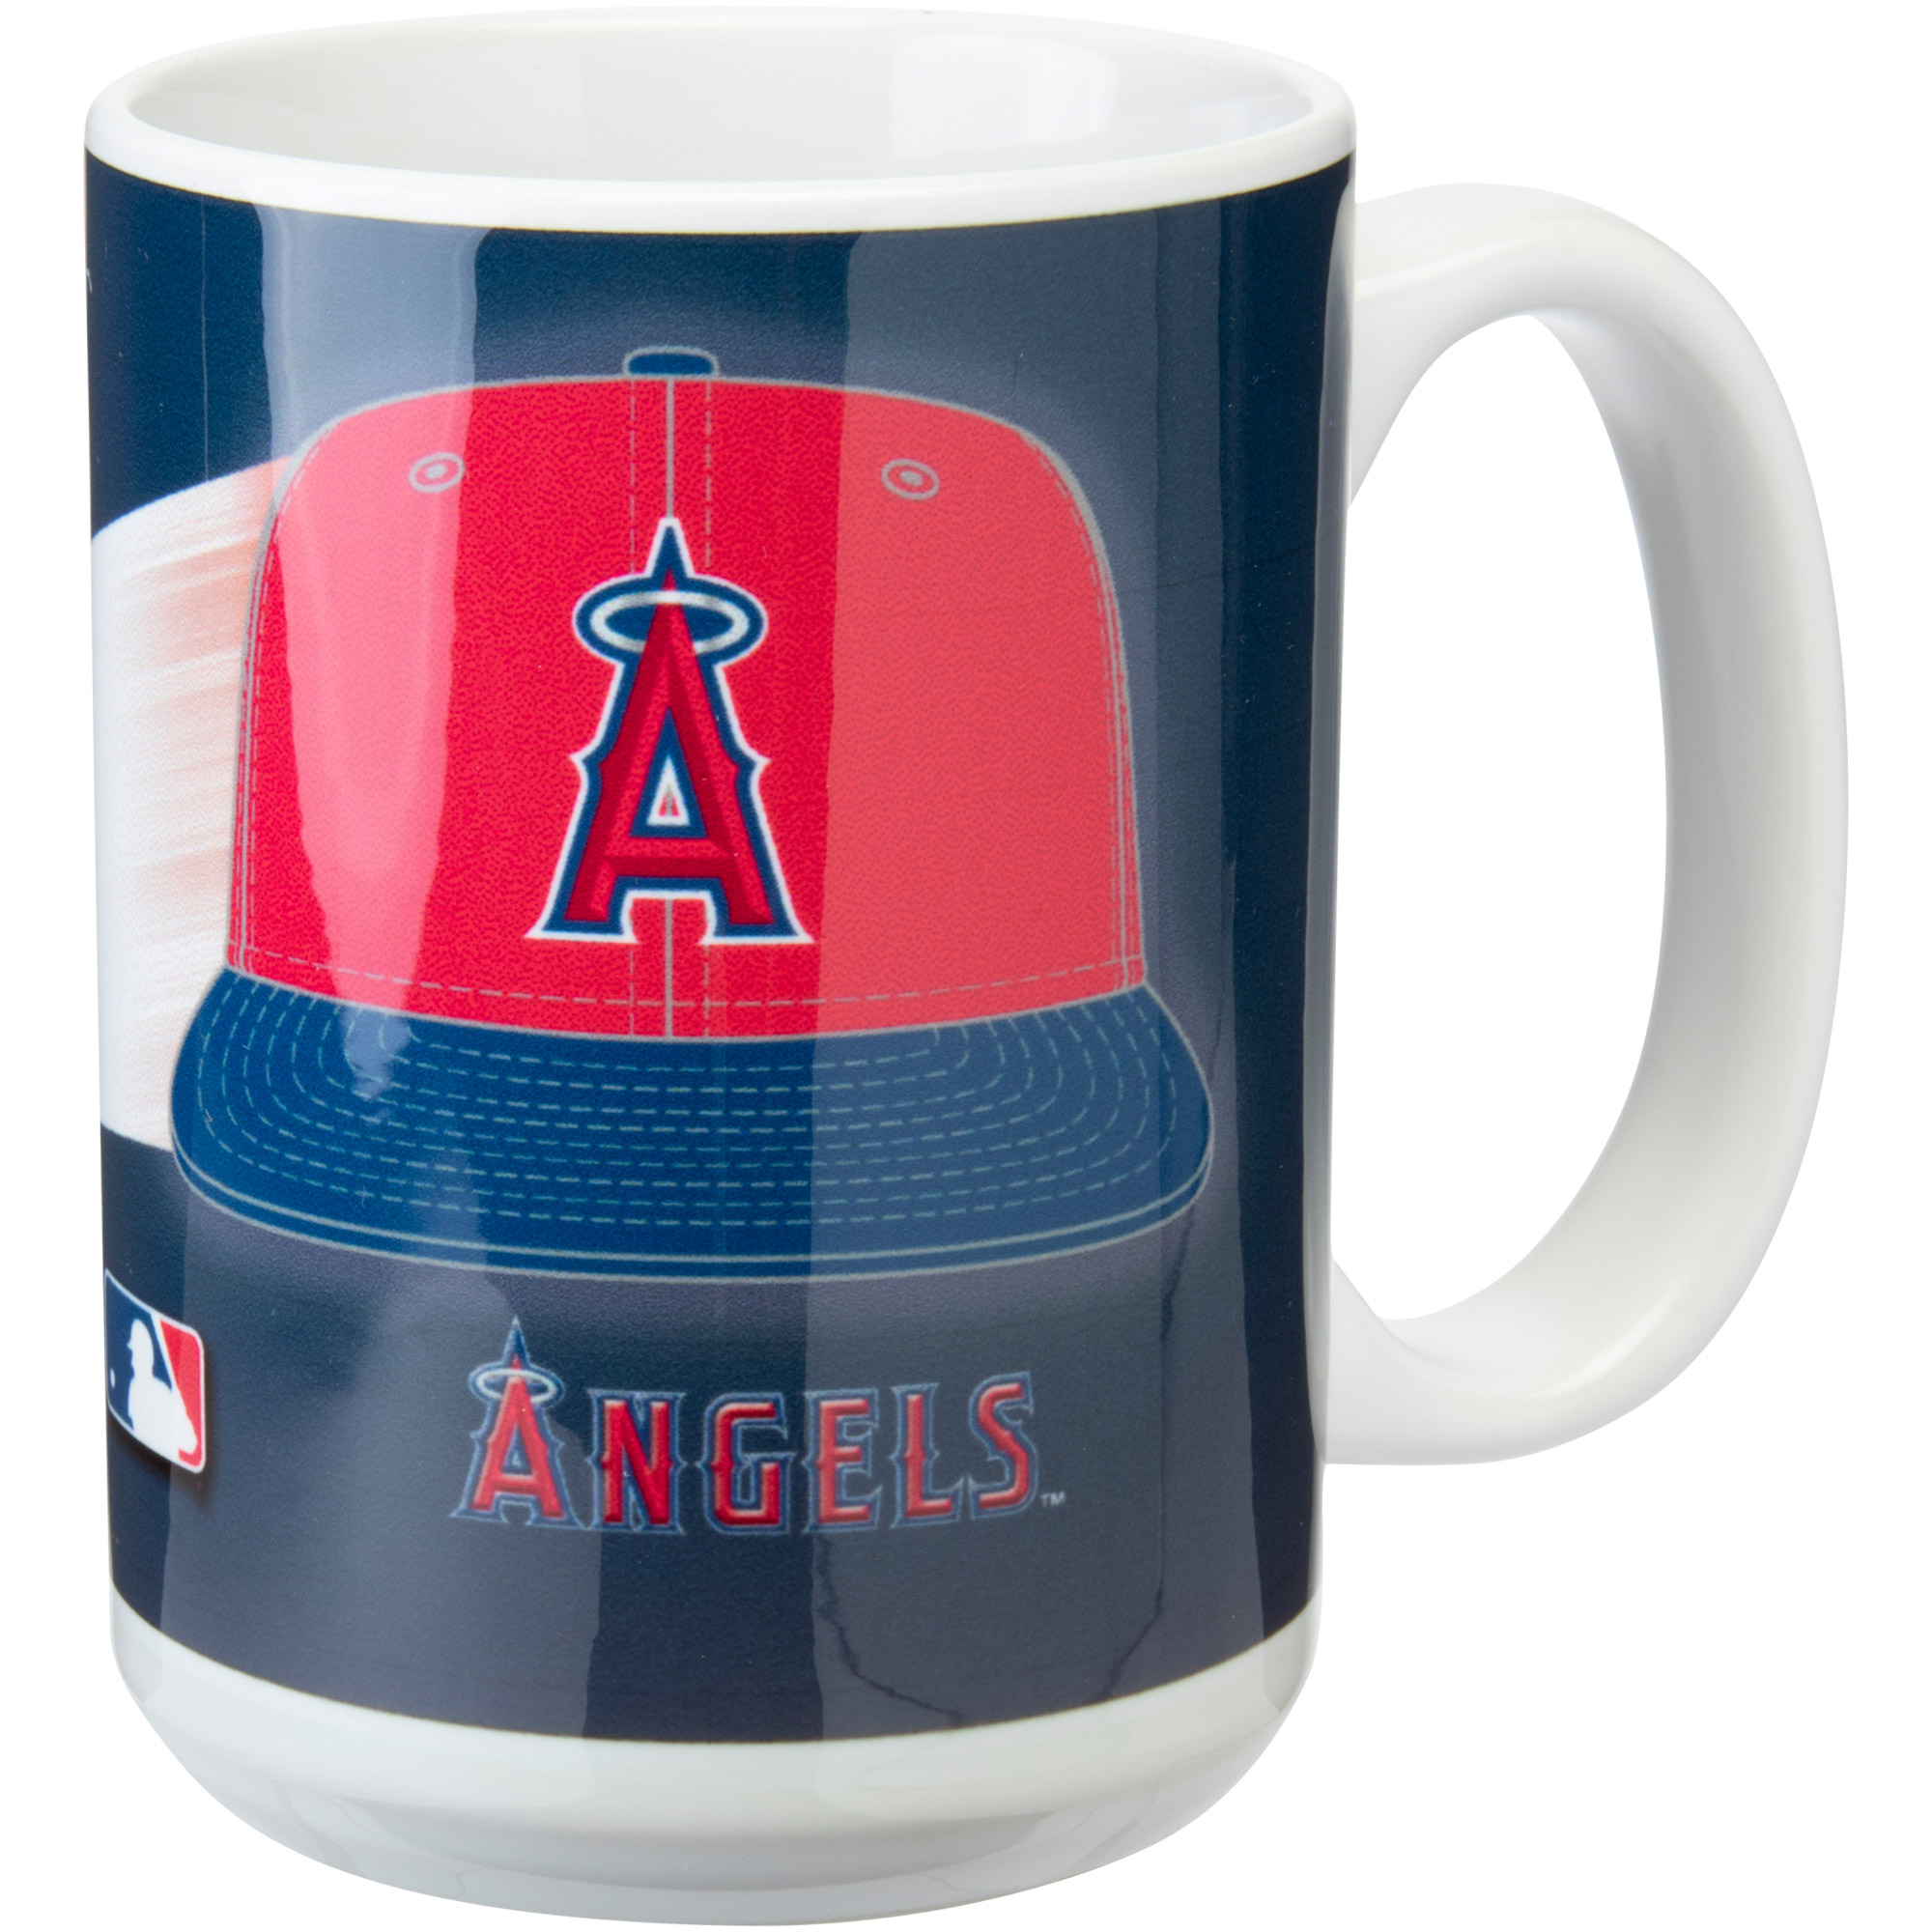 Los Angeles Angels 15oz. Team 3D Graphic Mug - No Size